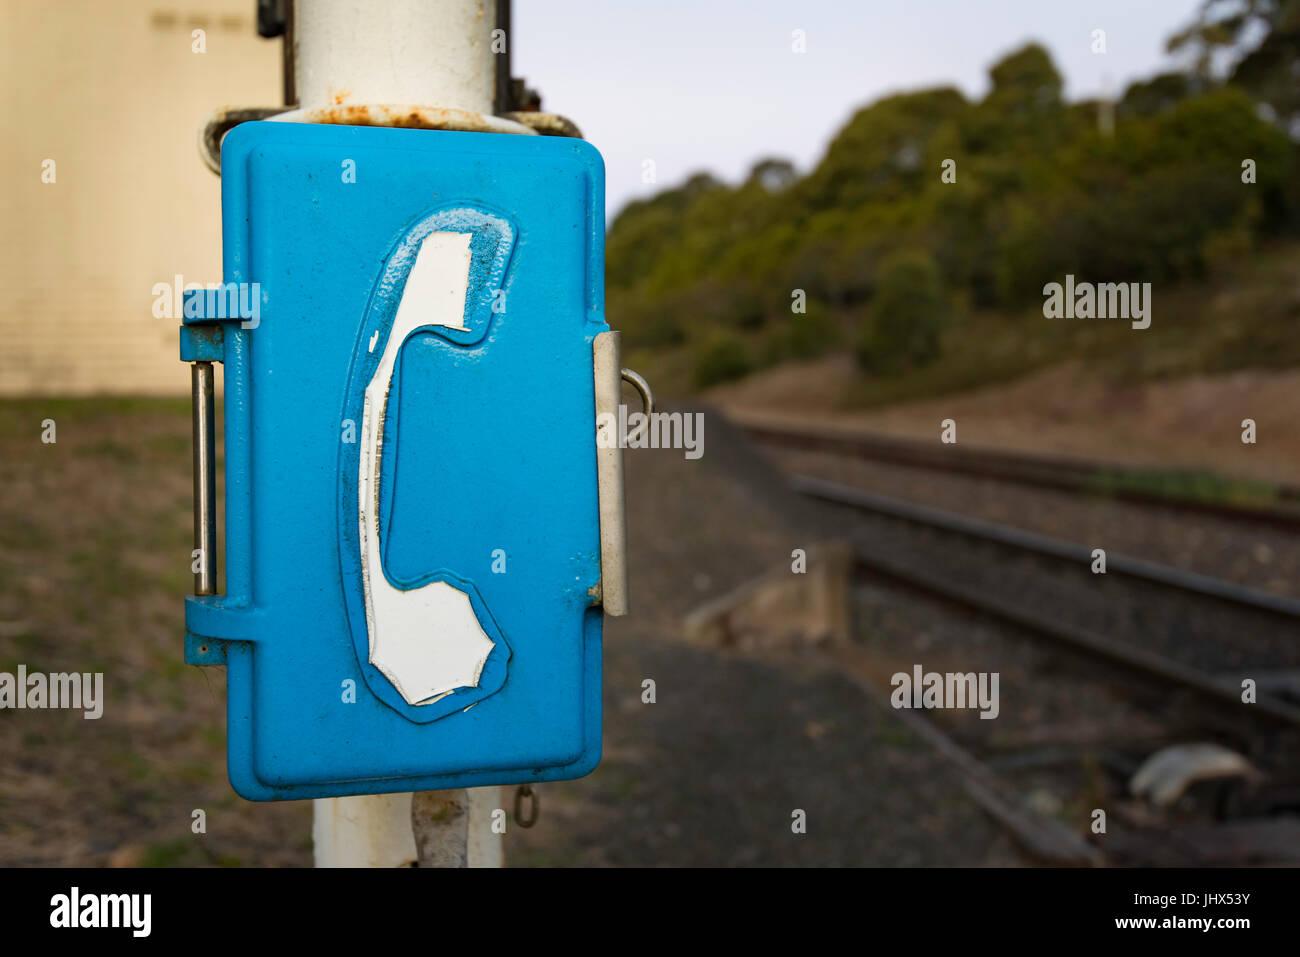 An Australian railway telephone line - Stock Image